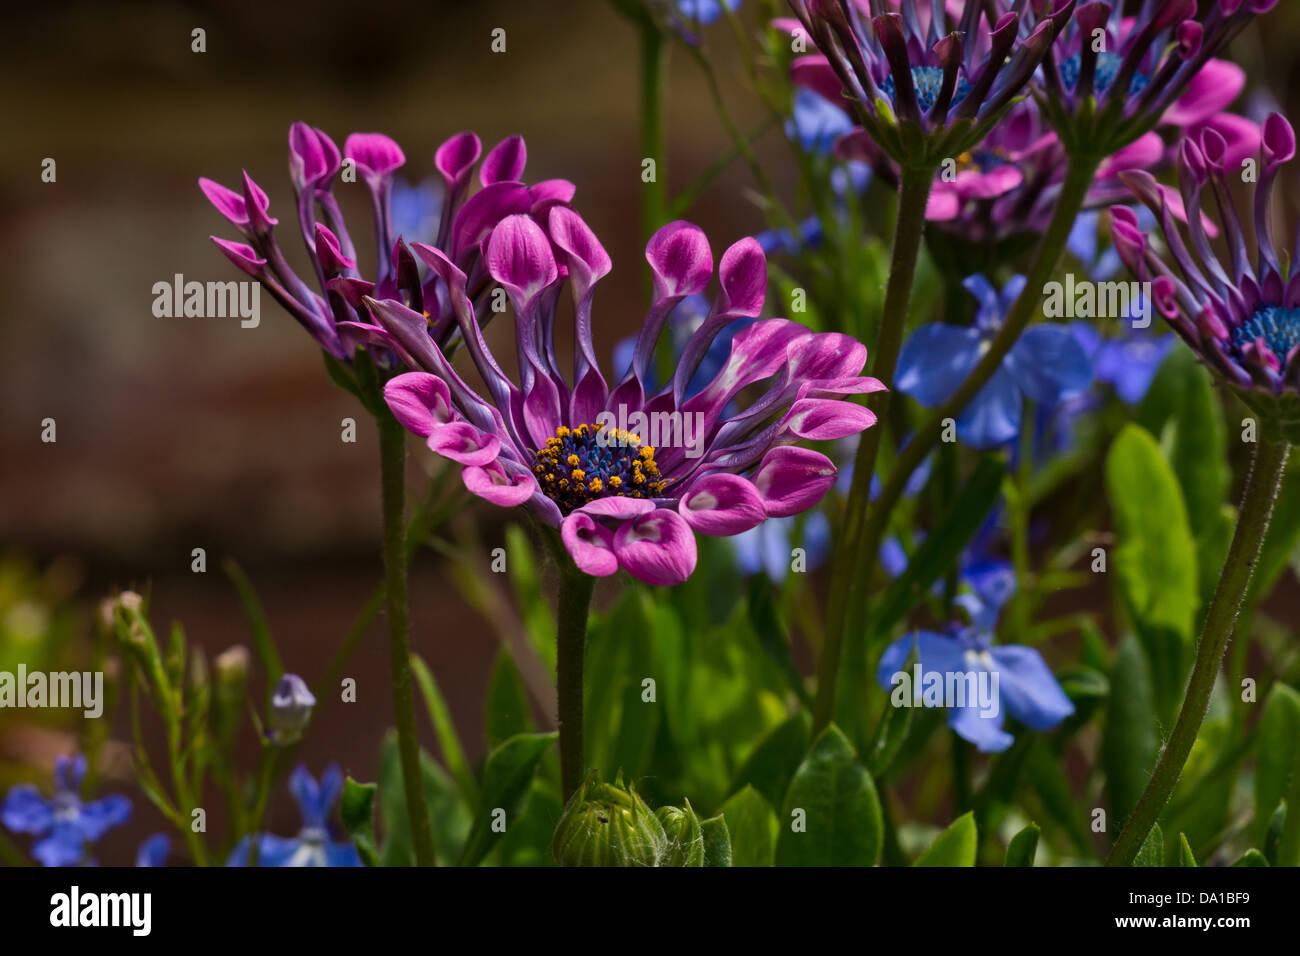 African Daisy Osteospermum Lavender Bliss Garden Flower Stock